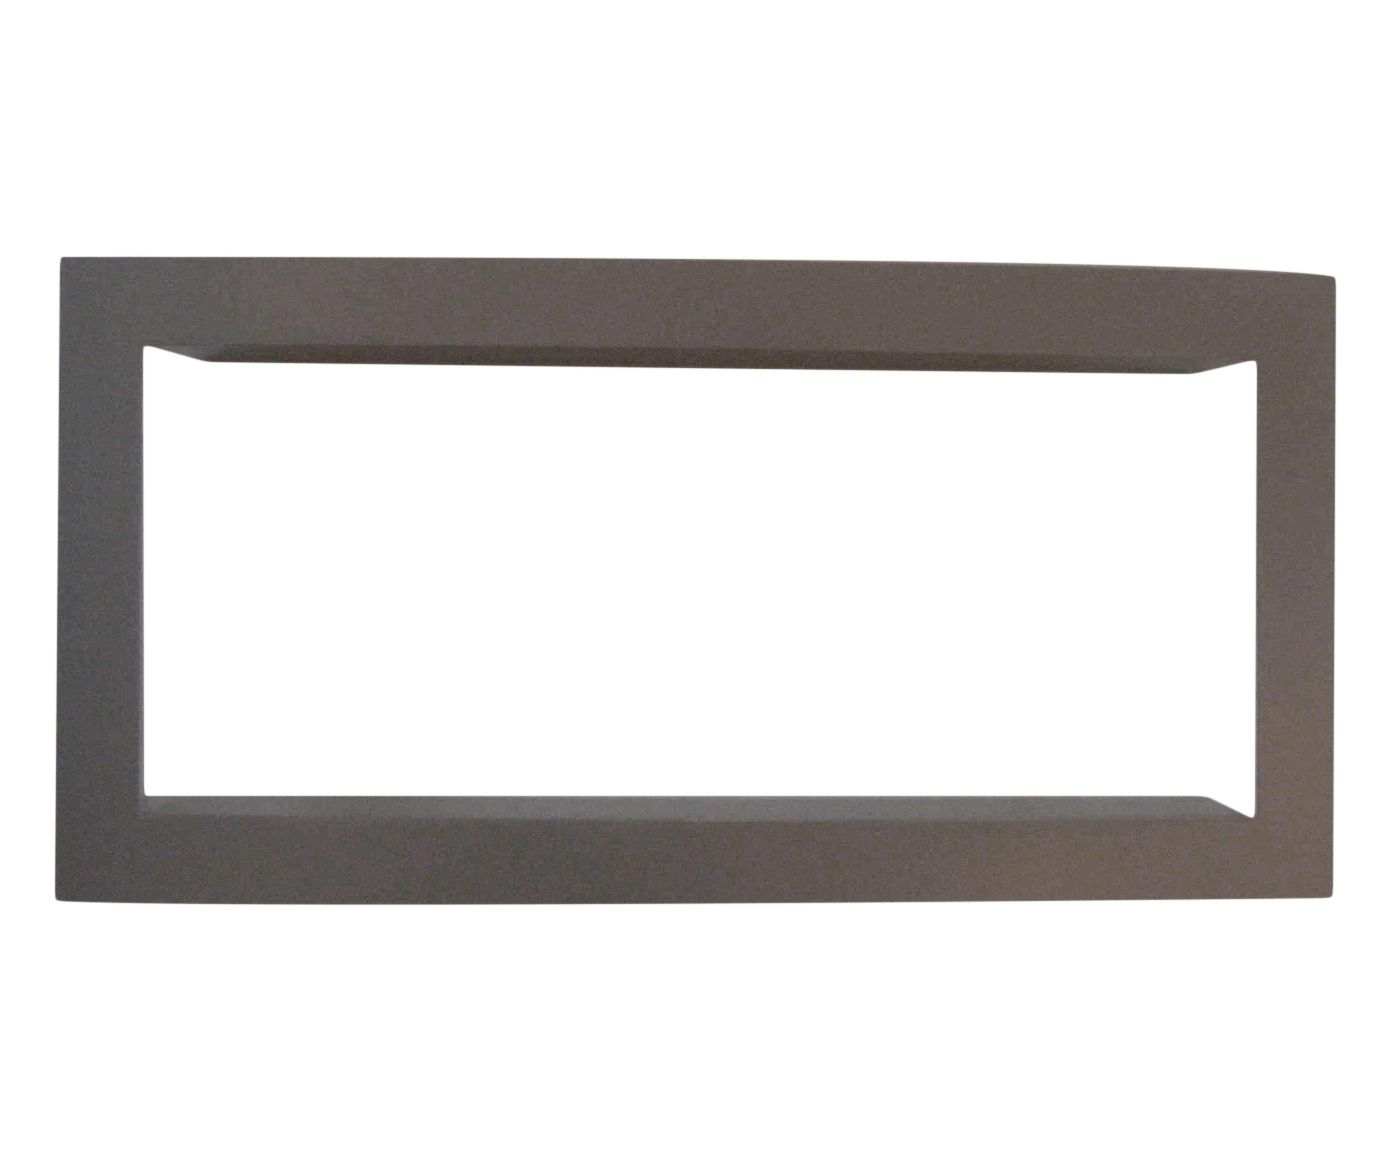 Prateleira Rústico Cinza - 60x30cm | Westwing.com.br